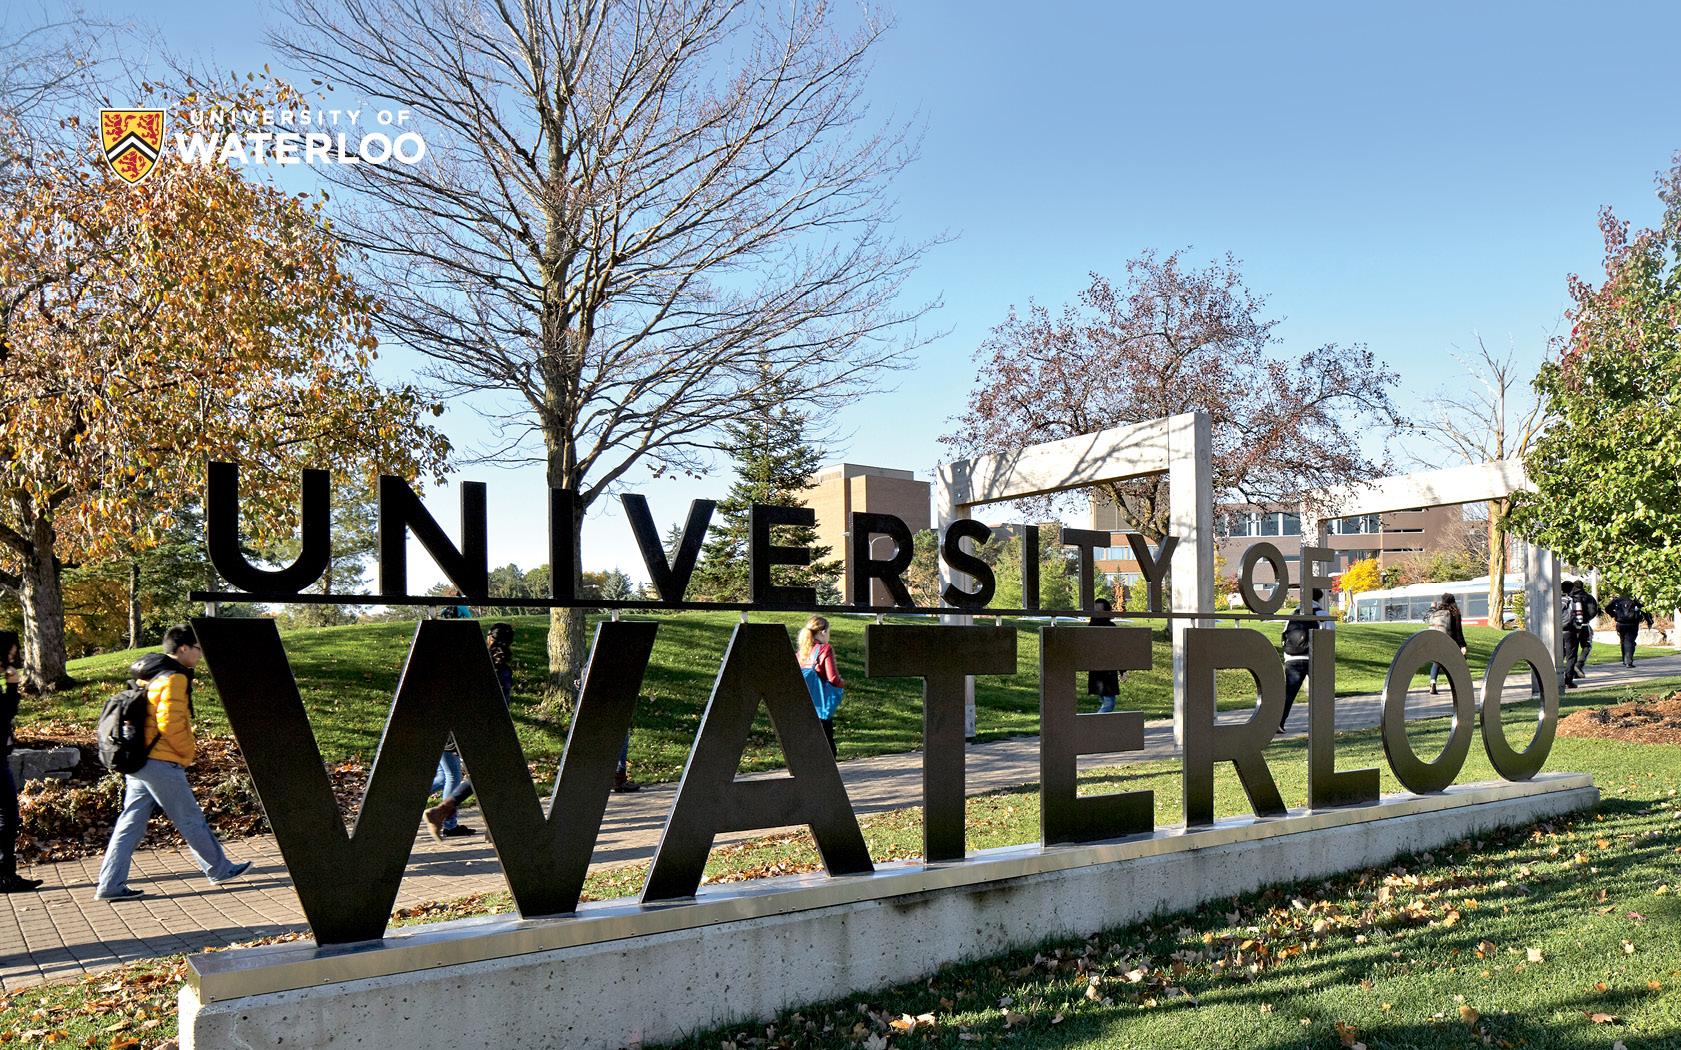 university of waterloo wallpapers | support waterloo | university of